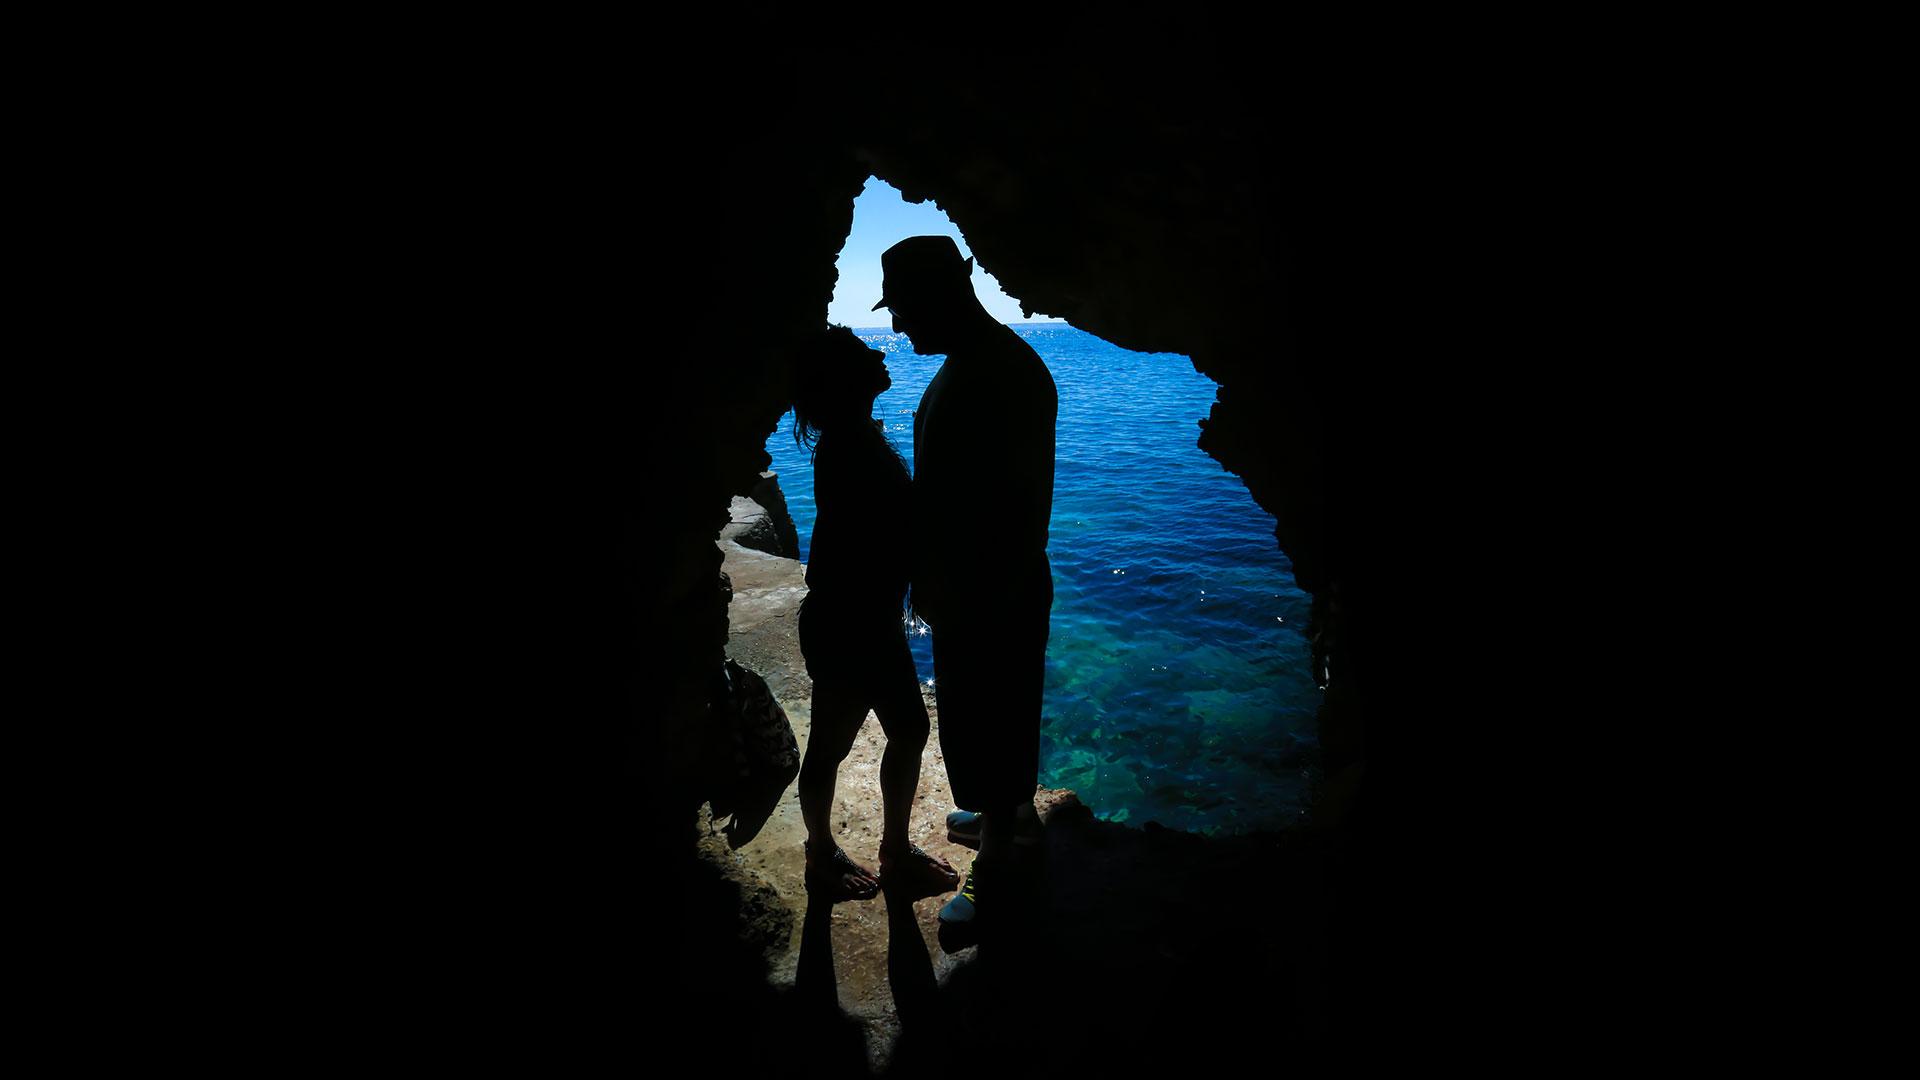 epic_sky_pictures_jamaica_cave_wedding_photography_closeup_photo_brampton_vancouver_los_angeles_destinationt_toronto_photoshoot_eshoot